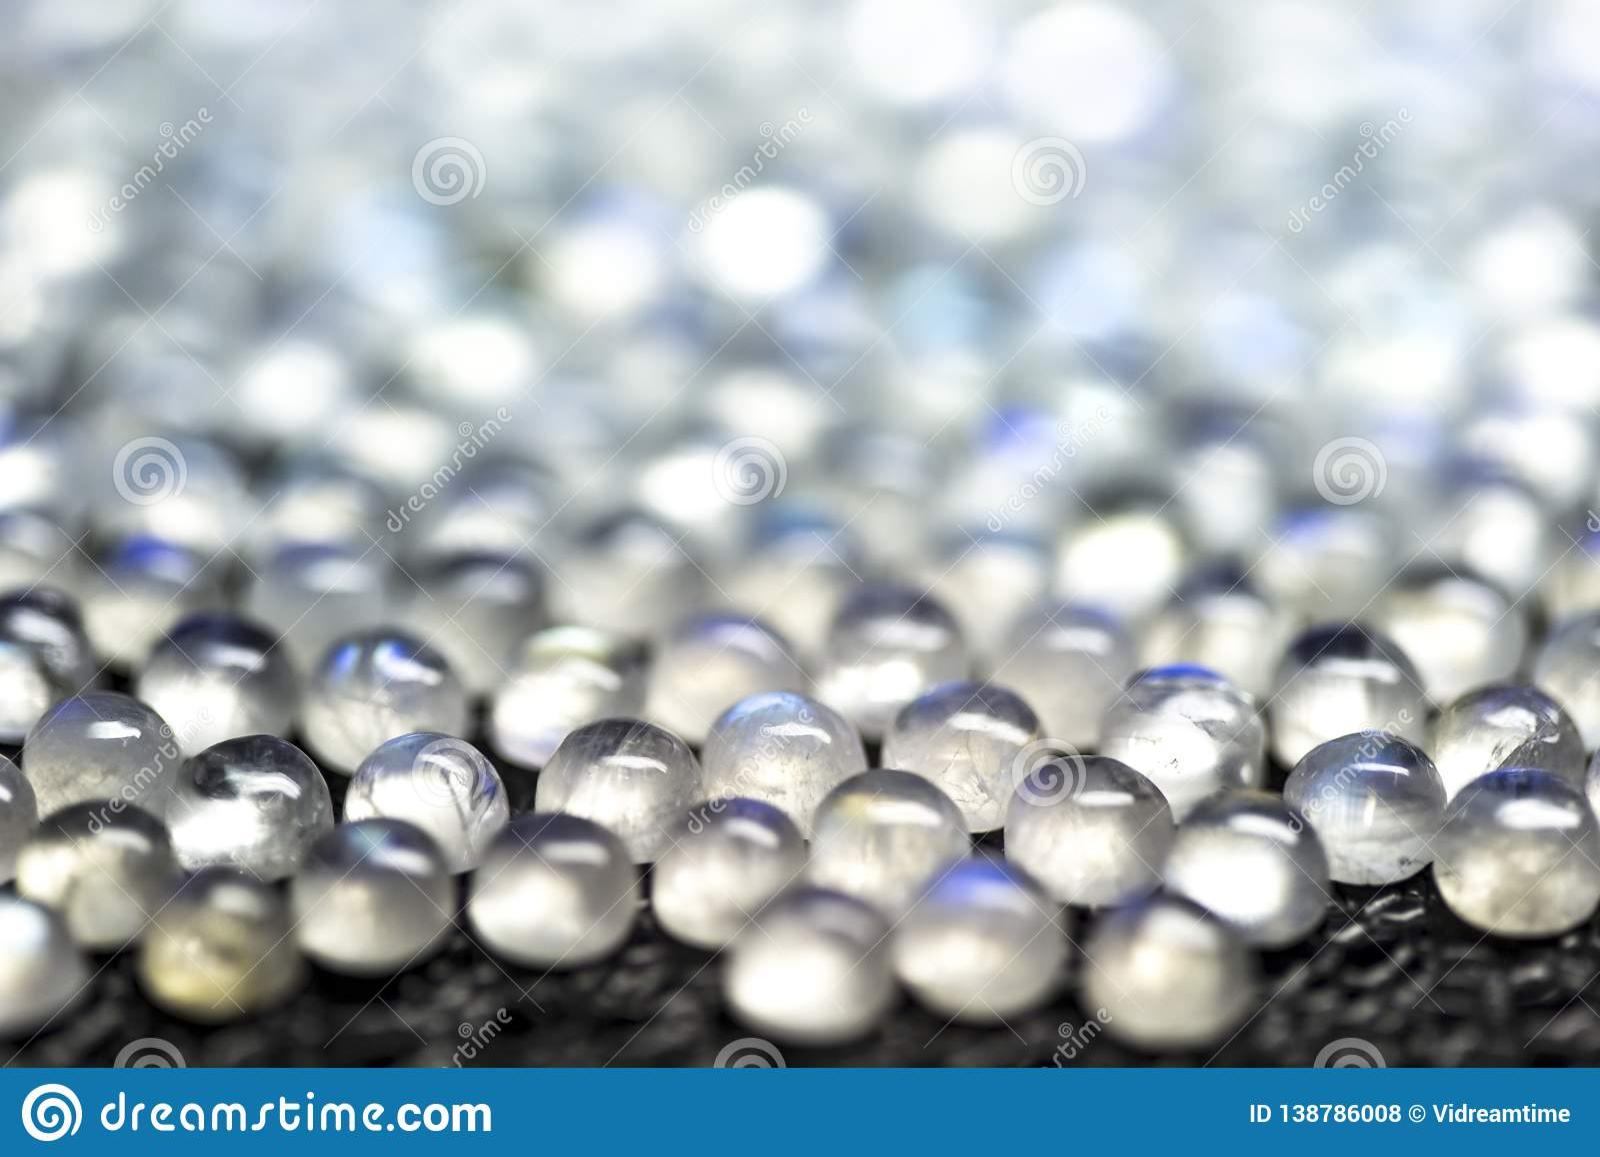 Bluered photo Gemstones Rainbow color Moonstones